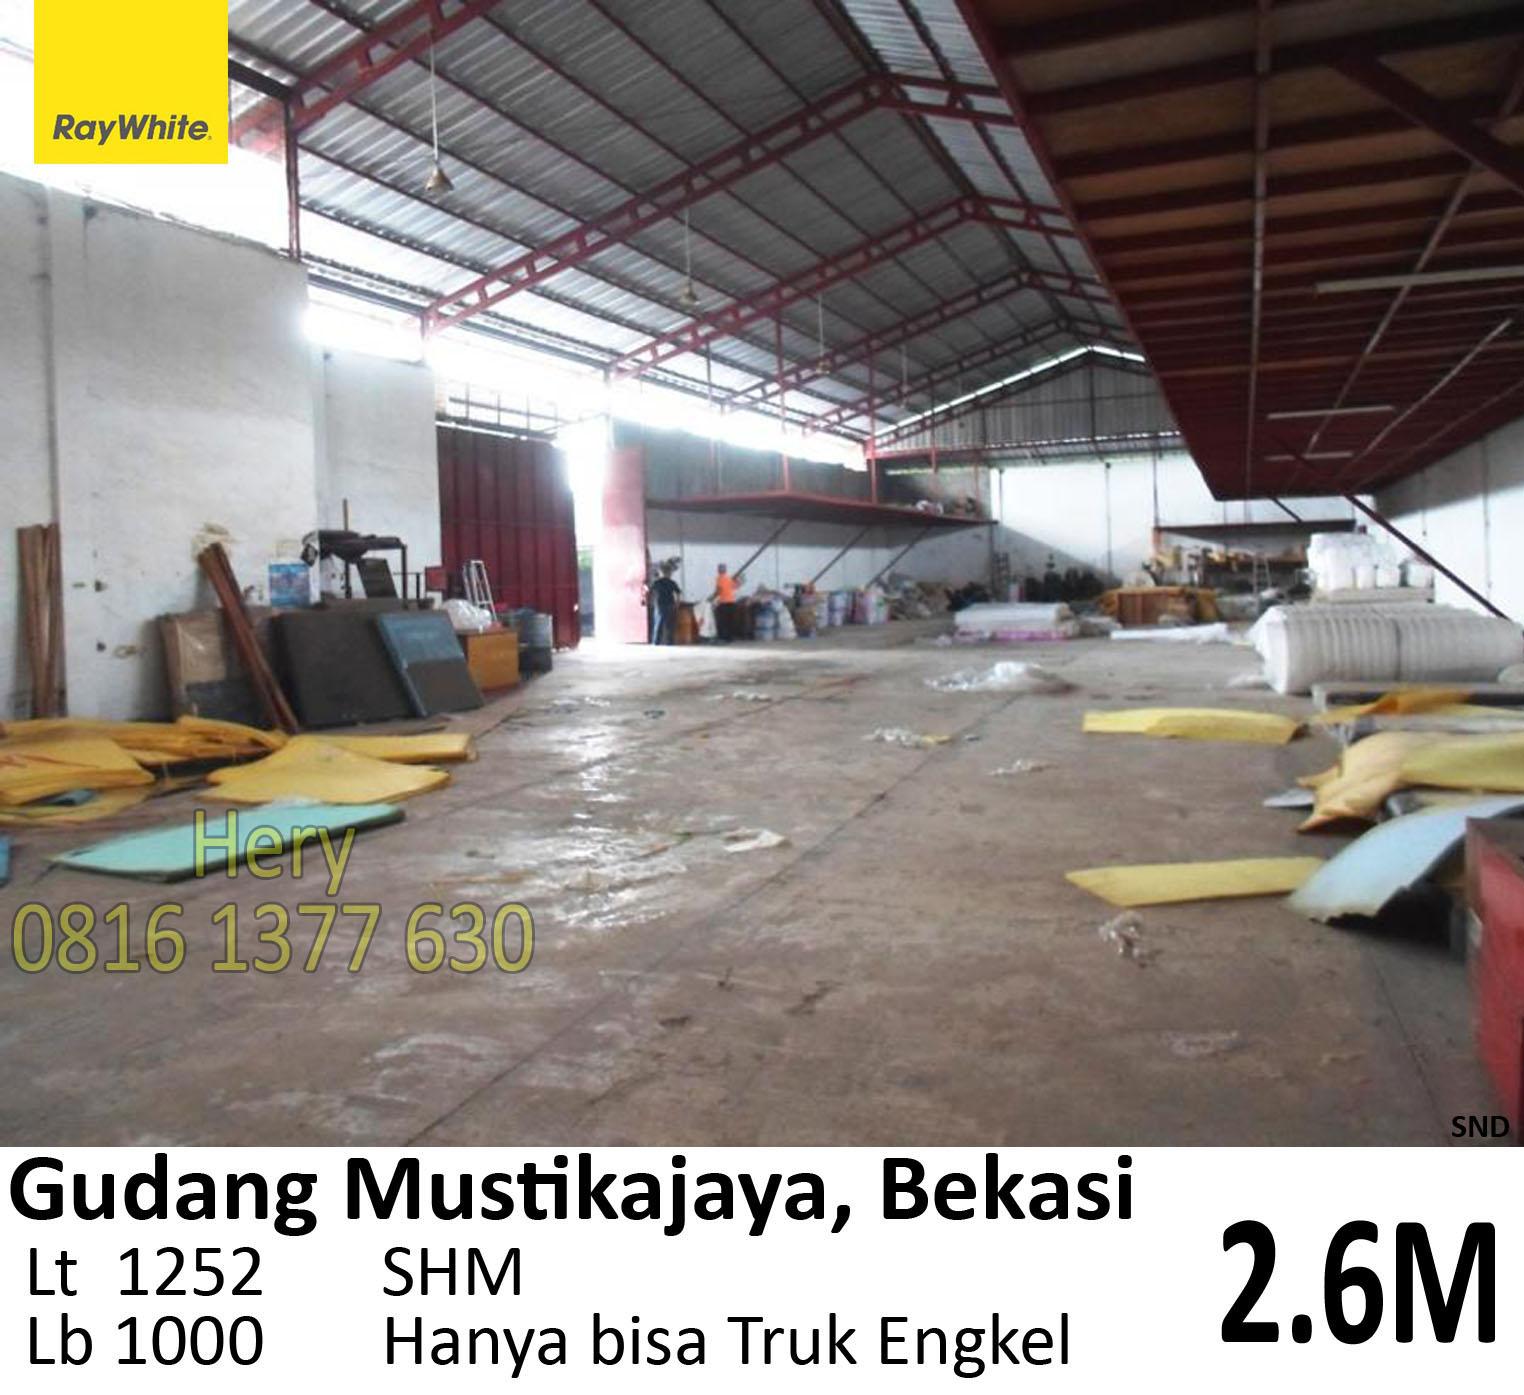 Dijual Gudang di Cimuning Mustikajaya Bekasi